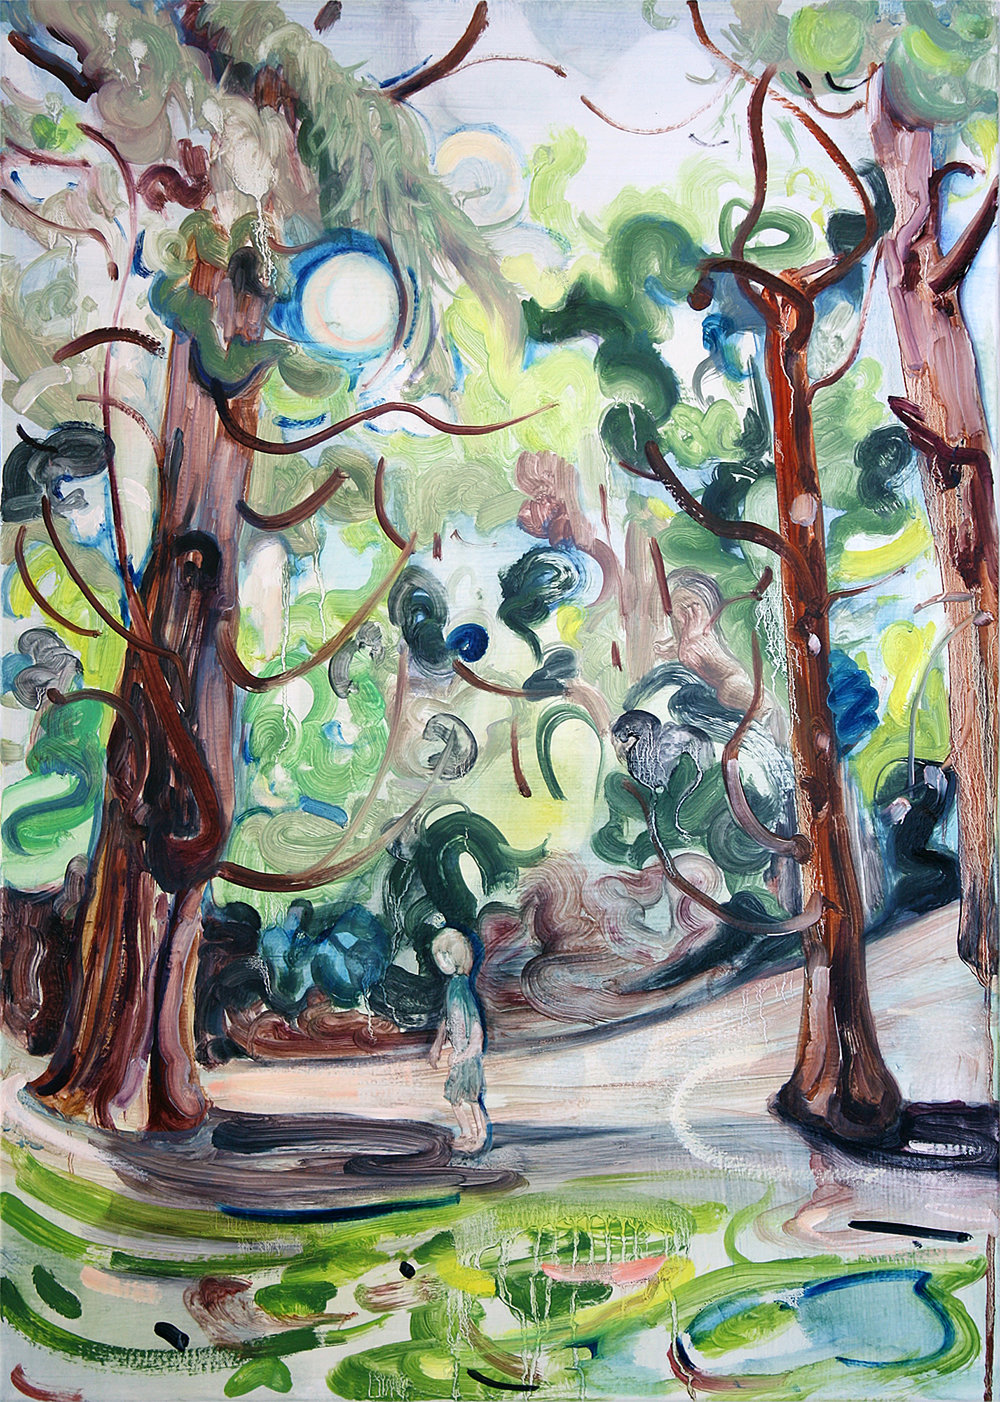 Caroline Thomson, I'll Drive a Tank Through Your Heart II, Oil on Canvas, 71 x 51 X 4 cm,  http://www.carolinethomson.com